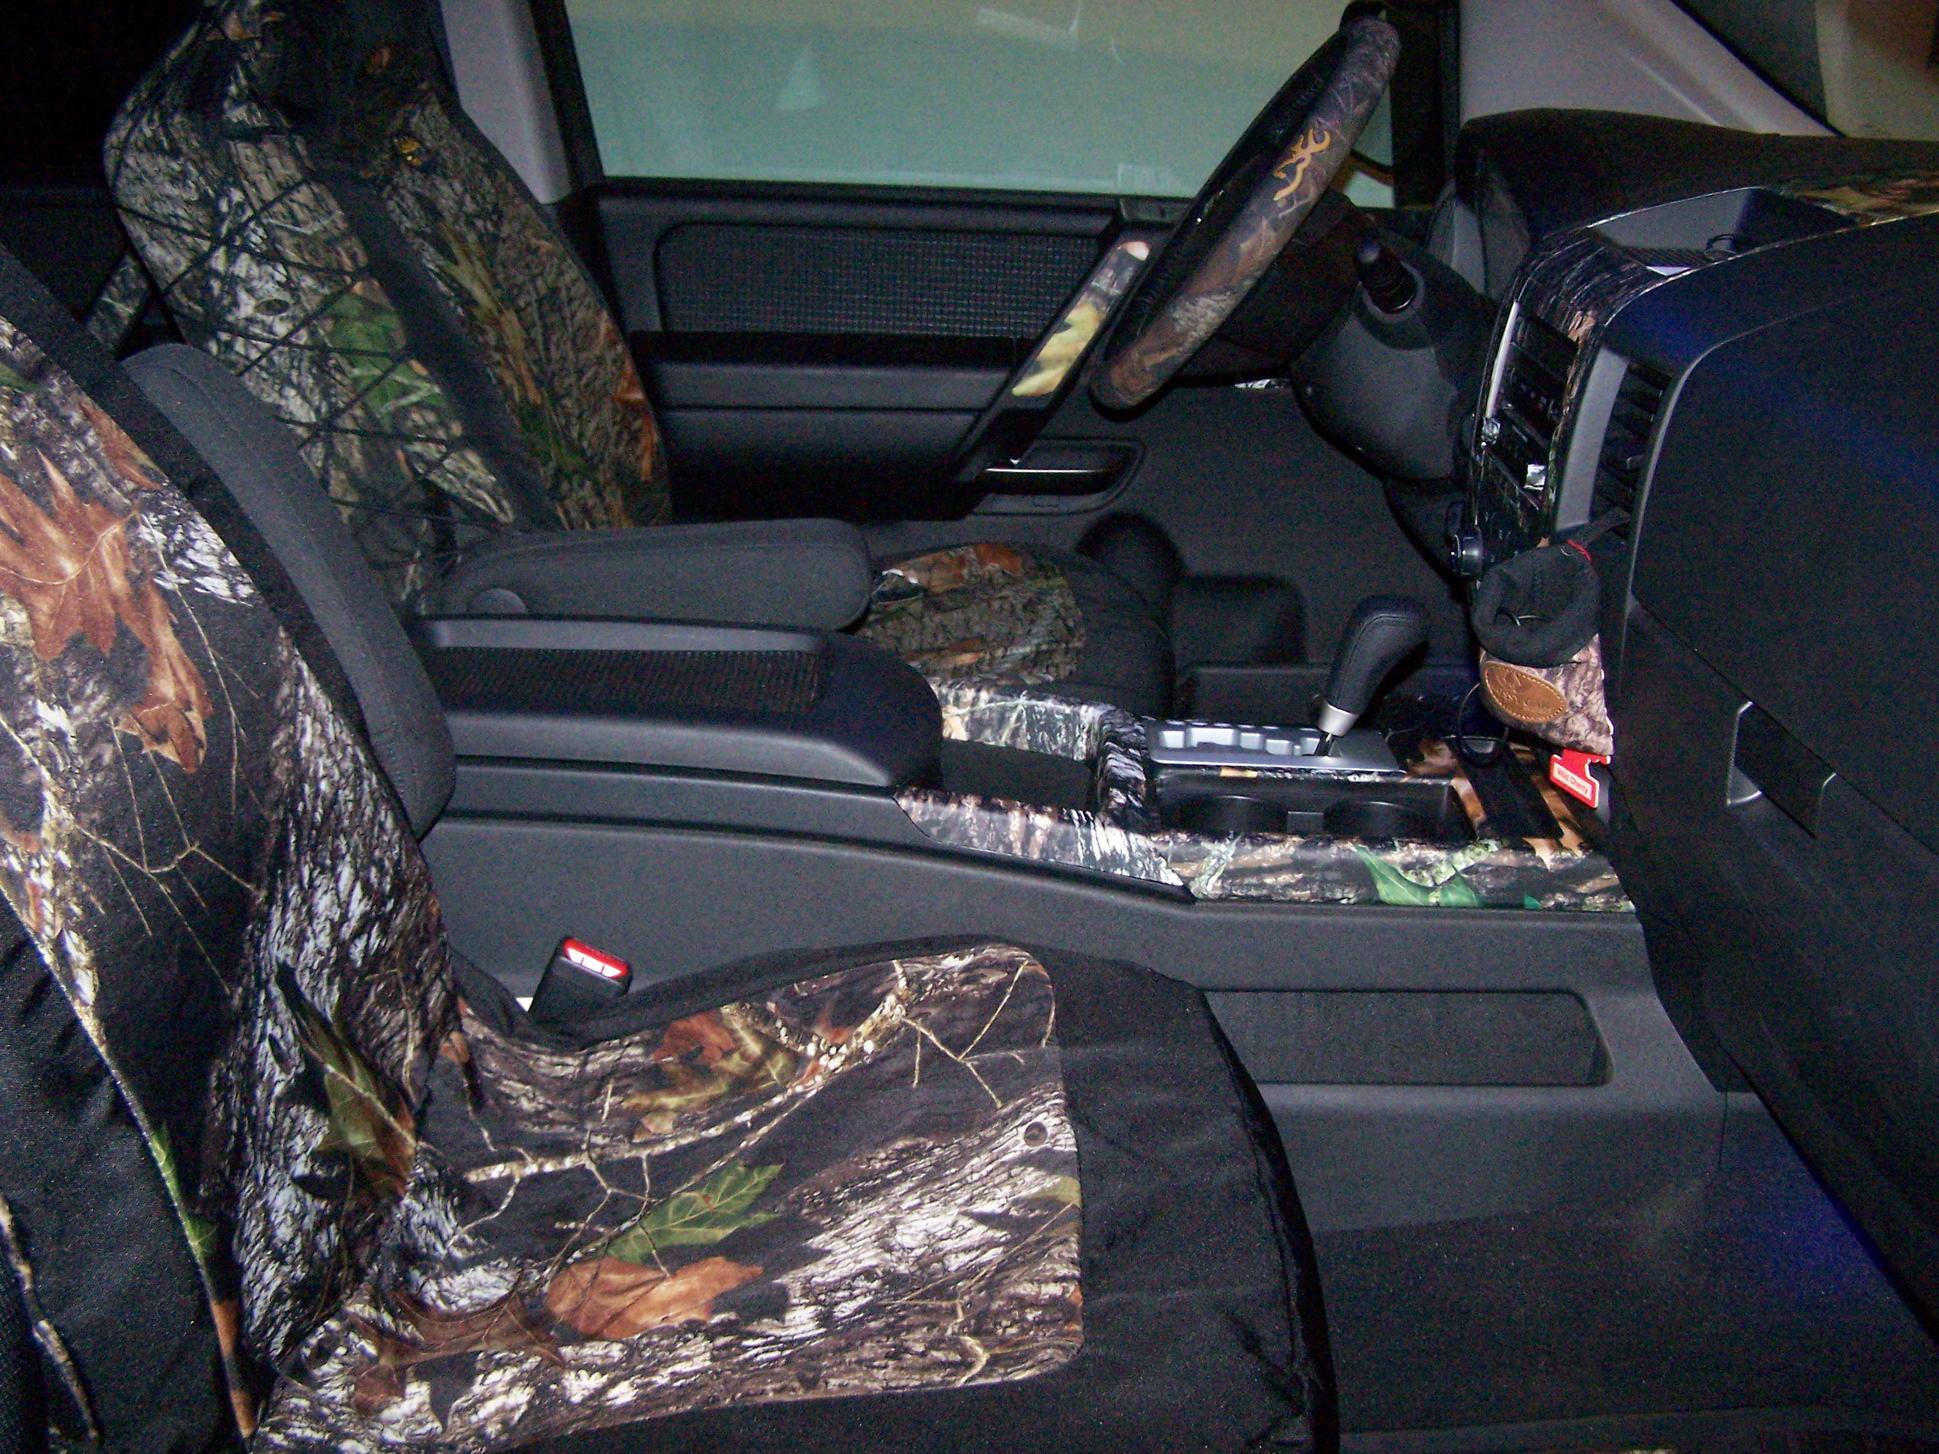 Cabelas Trail Gear Seat Covers Nissan Titan Forum